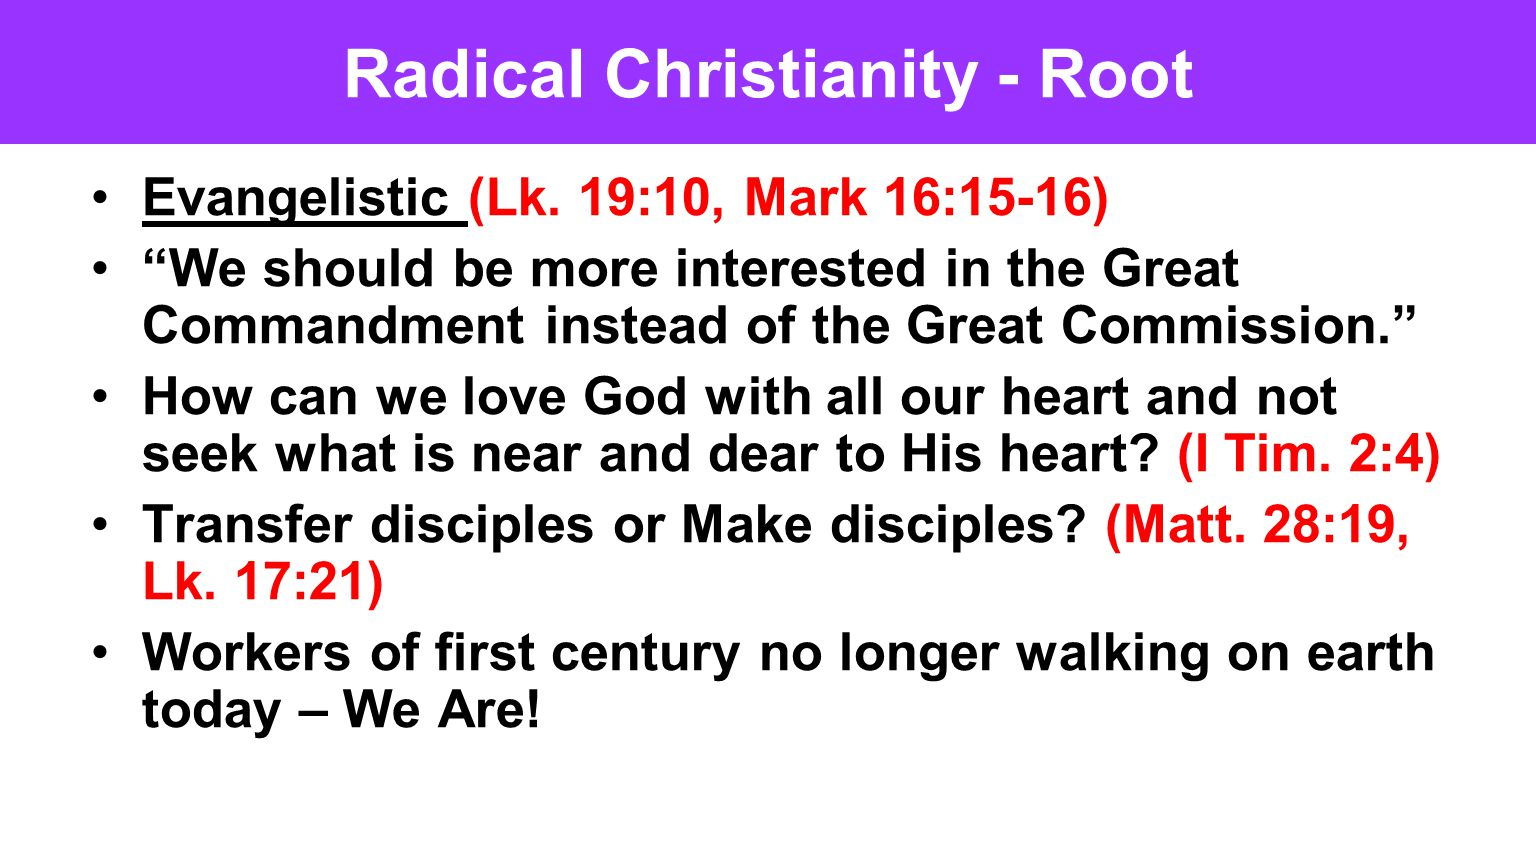 Radical Christianity - Root